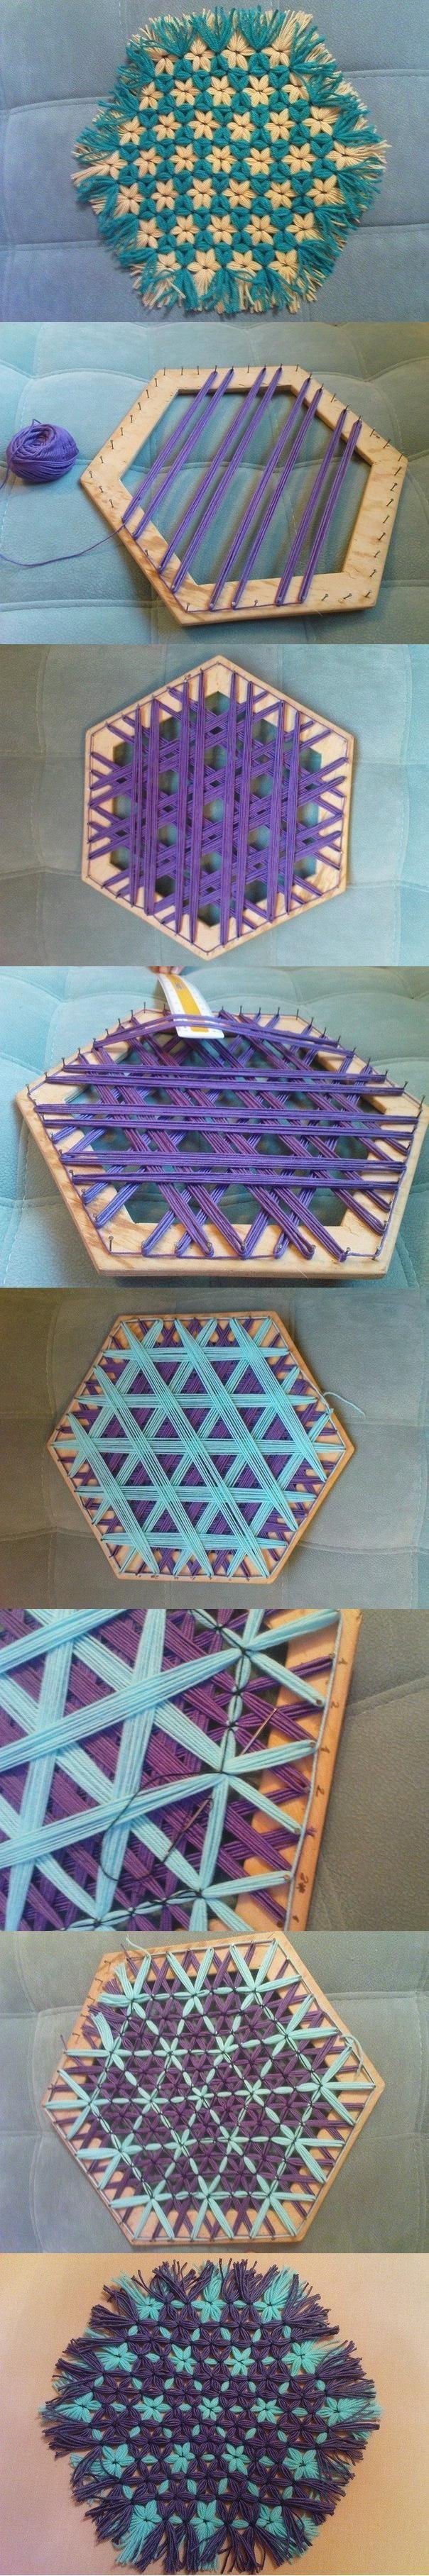 DIY Beautiful Hexagonal Coaster | handwerk | Pinterest | Weben ...